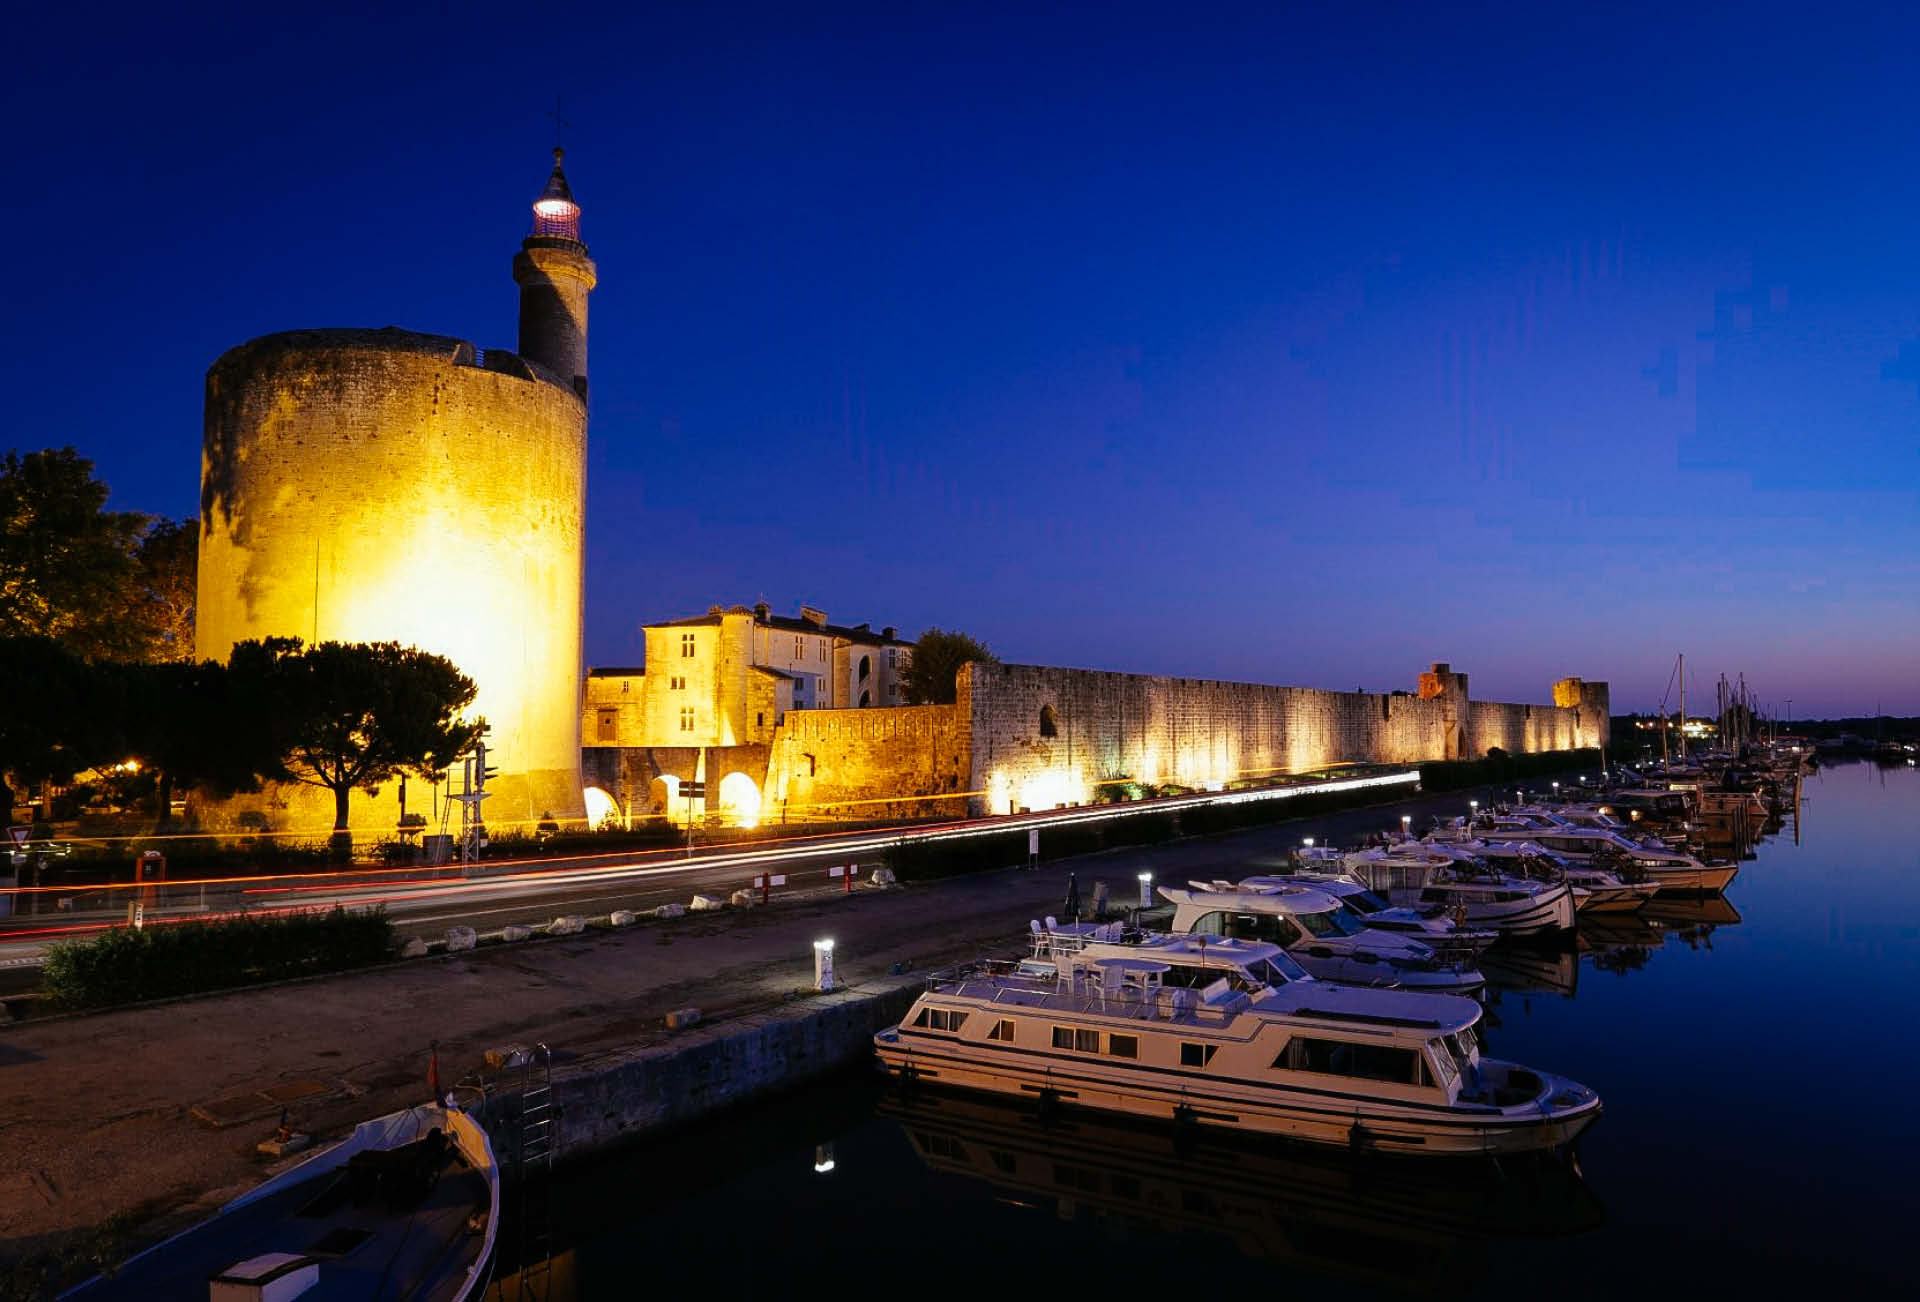 provence-camargue-radtour10.jpg